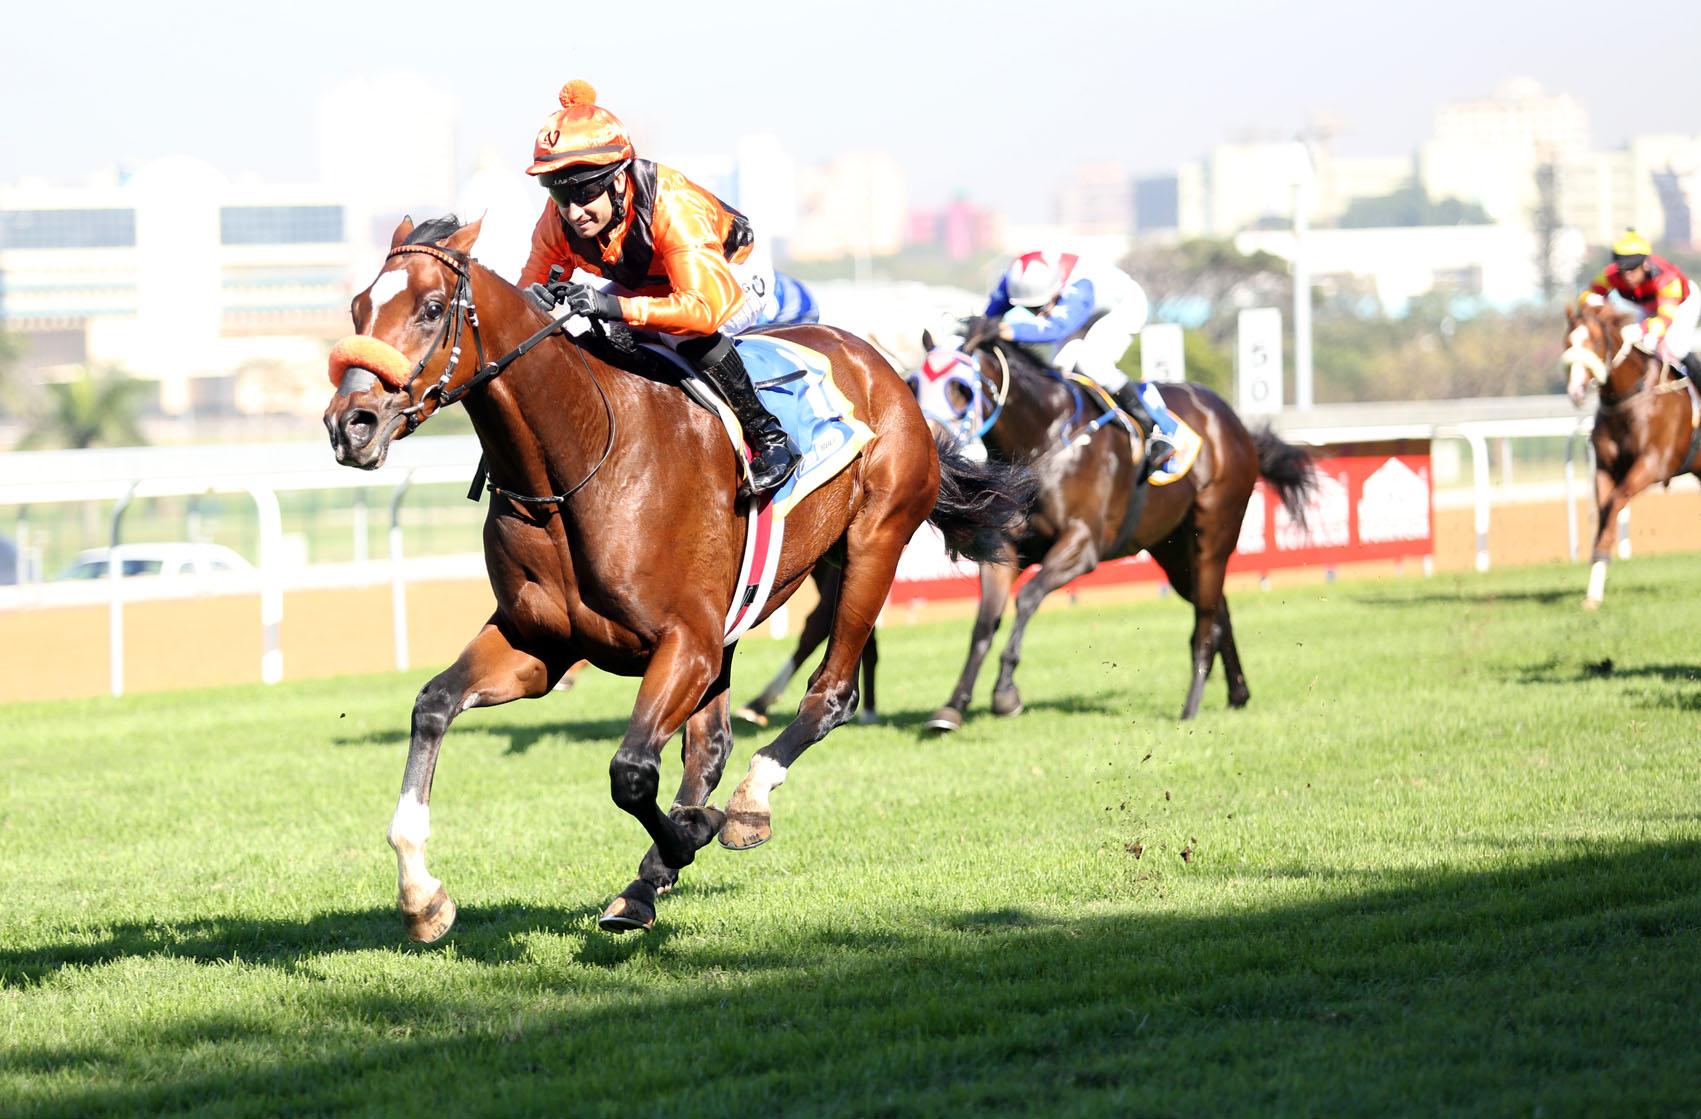 Turffontein horse race betting 101 football betting guide uk tv